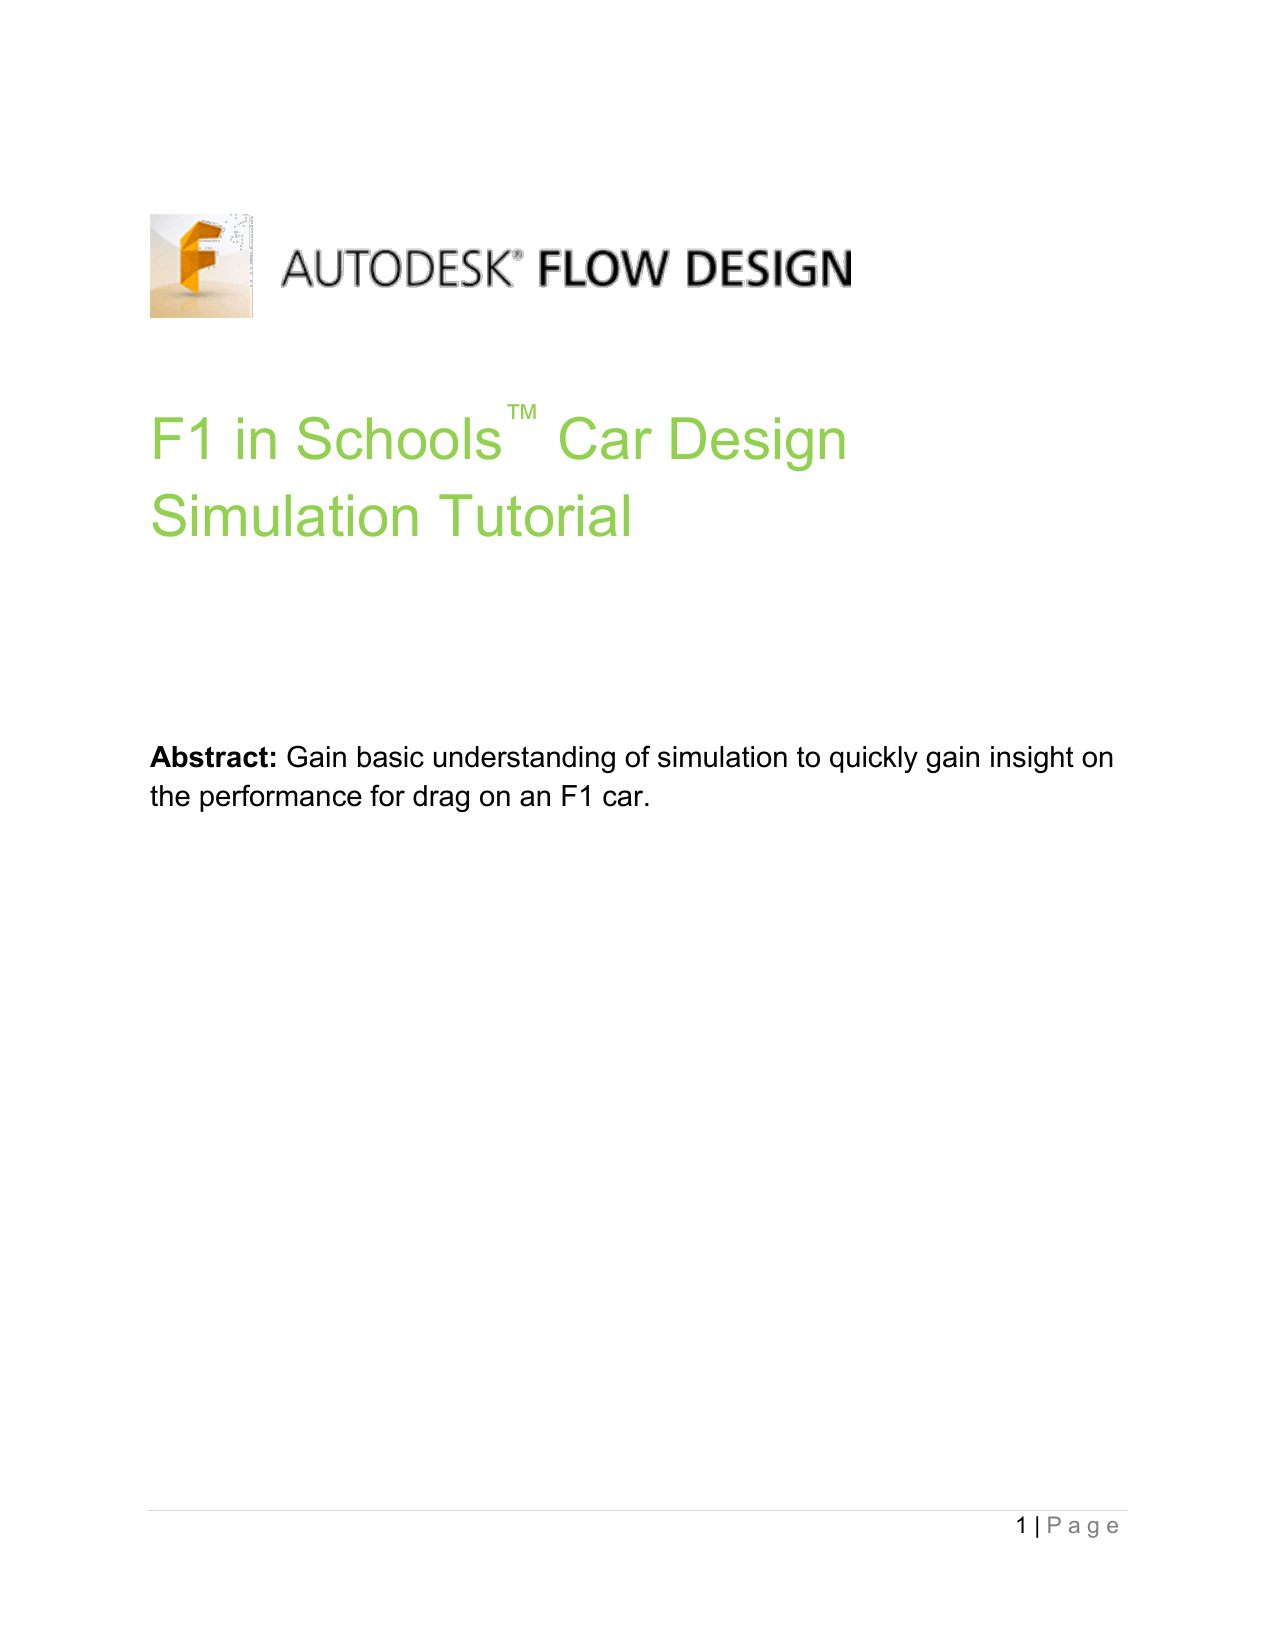 F1 Tutorial FlowDesign